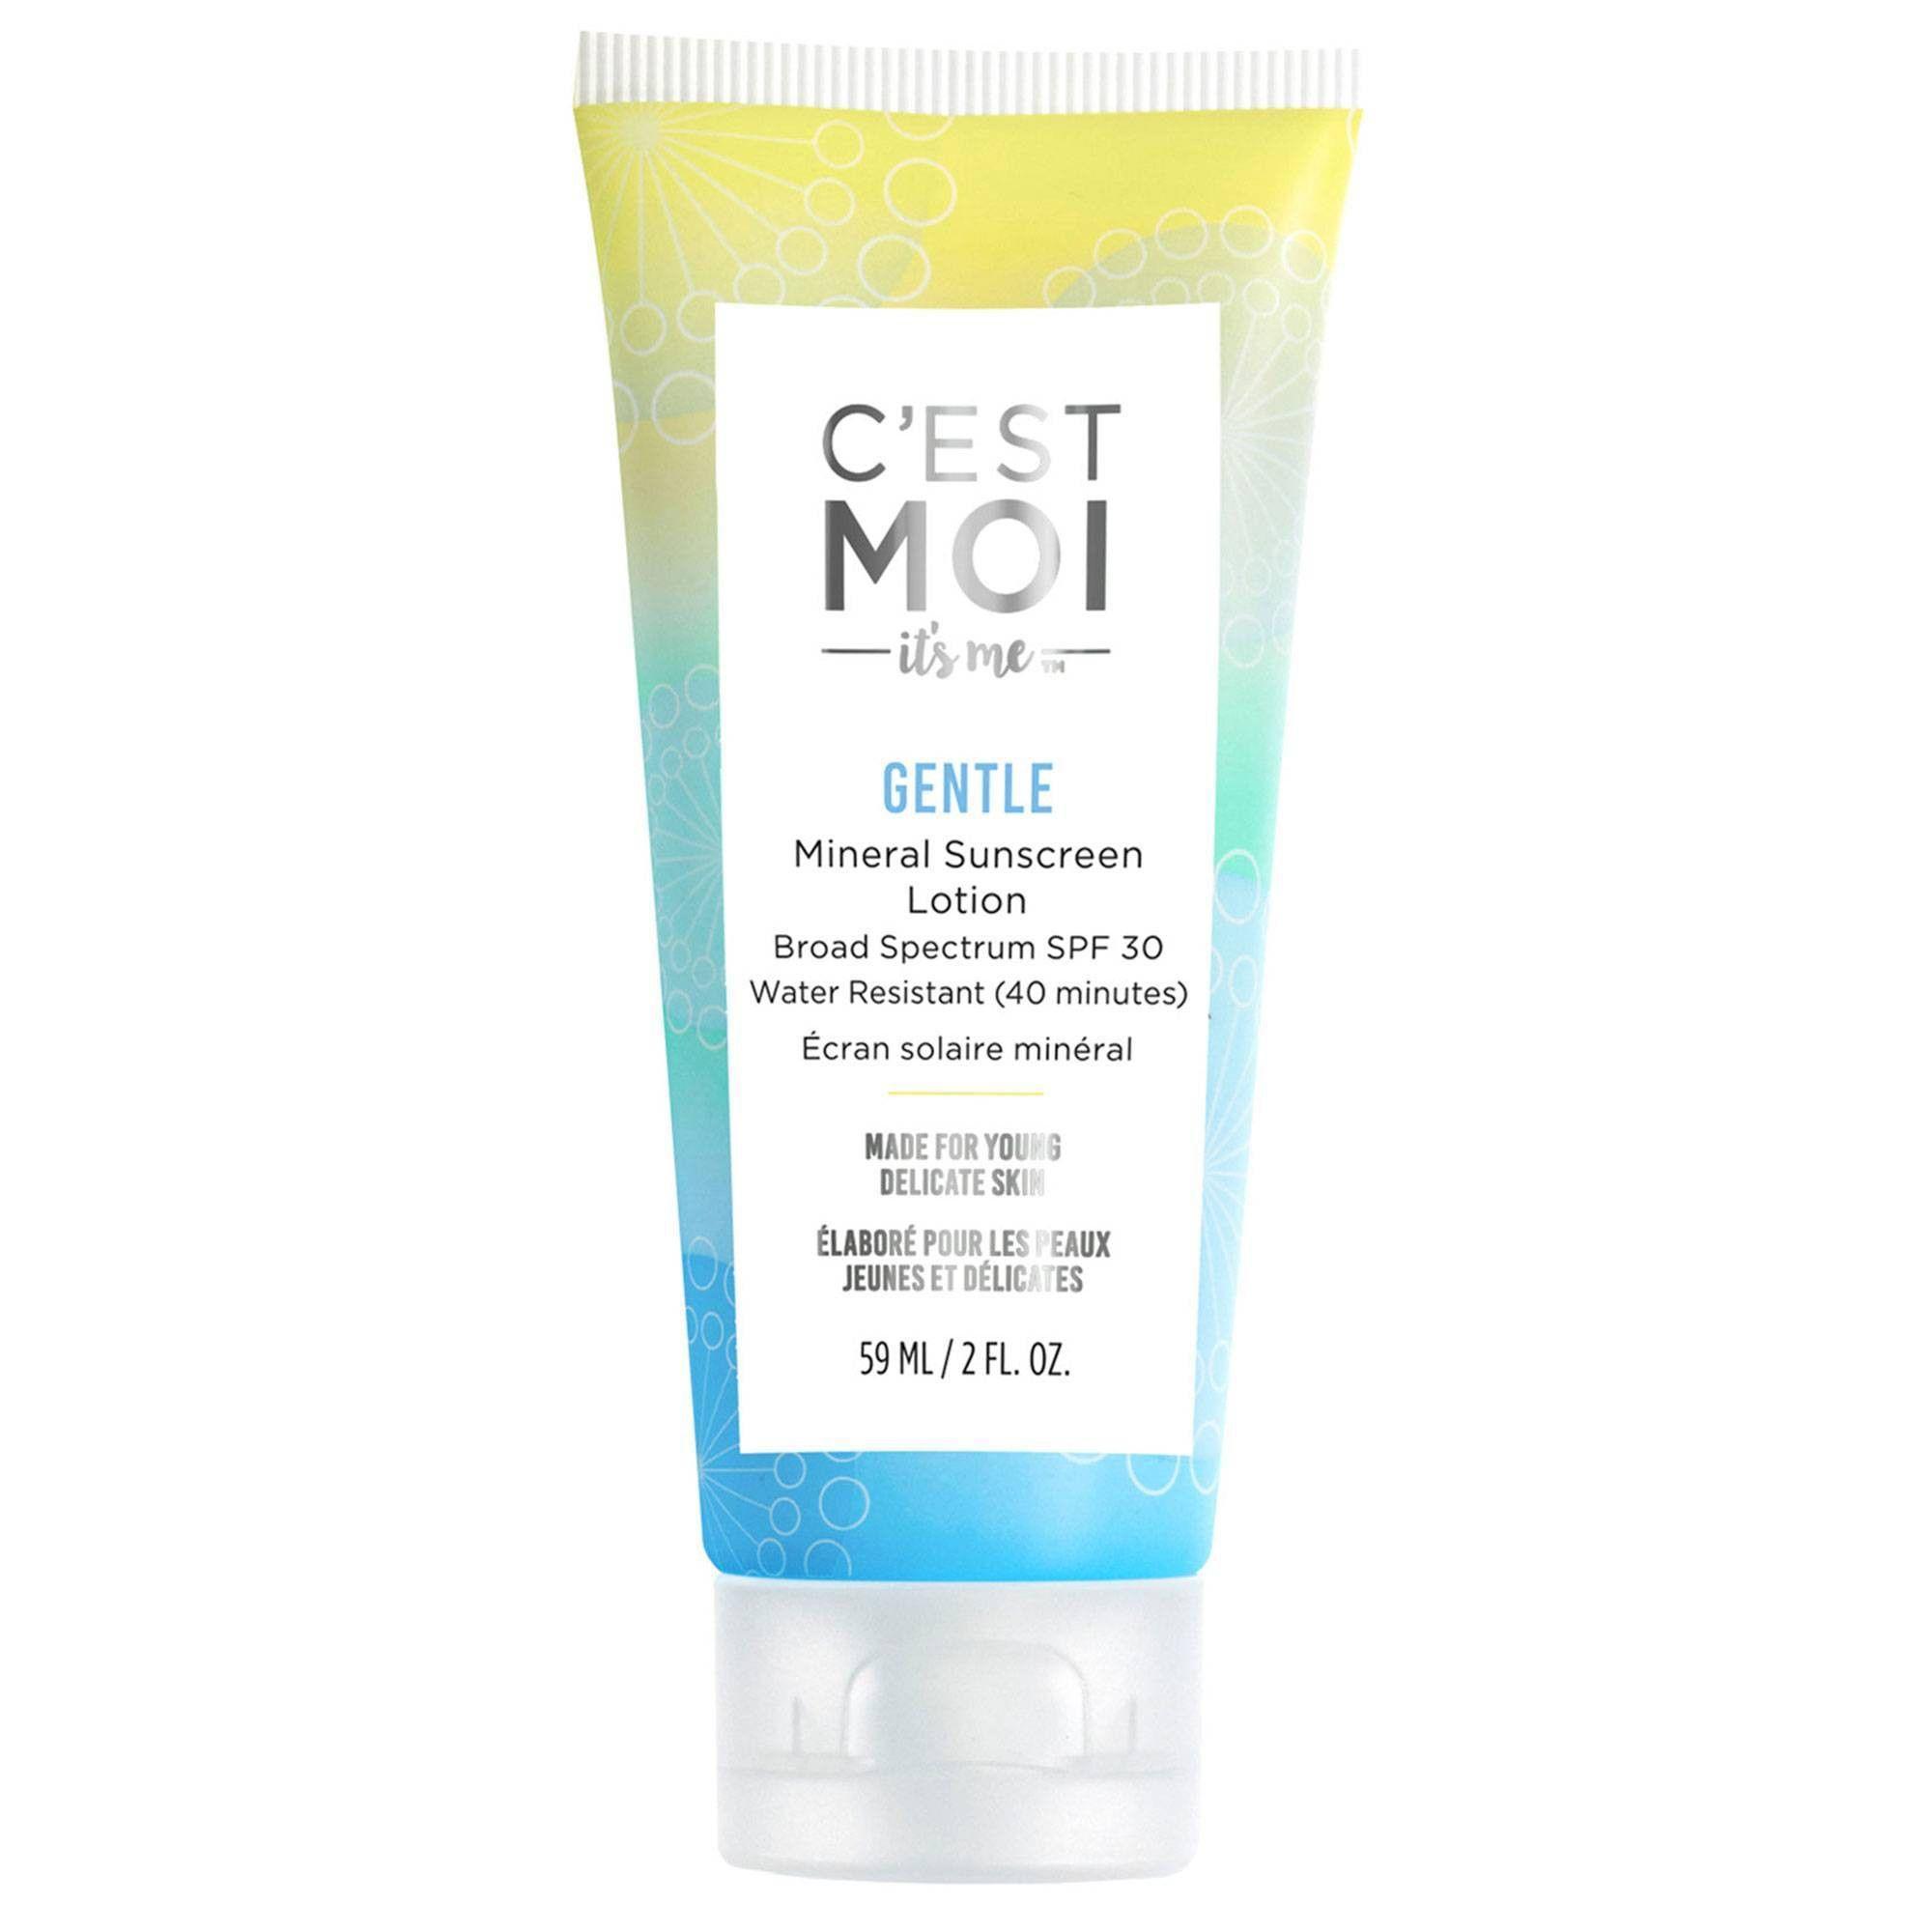 C'est Moi Gentle Mineral Sunscreen Lotion SPF 30 2 fl